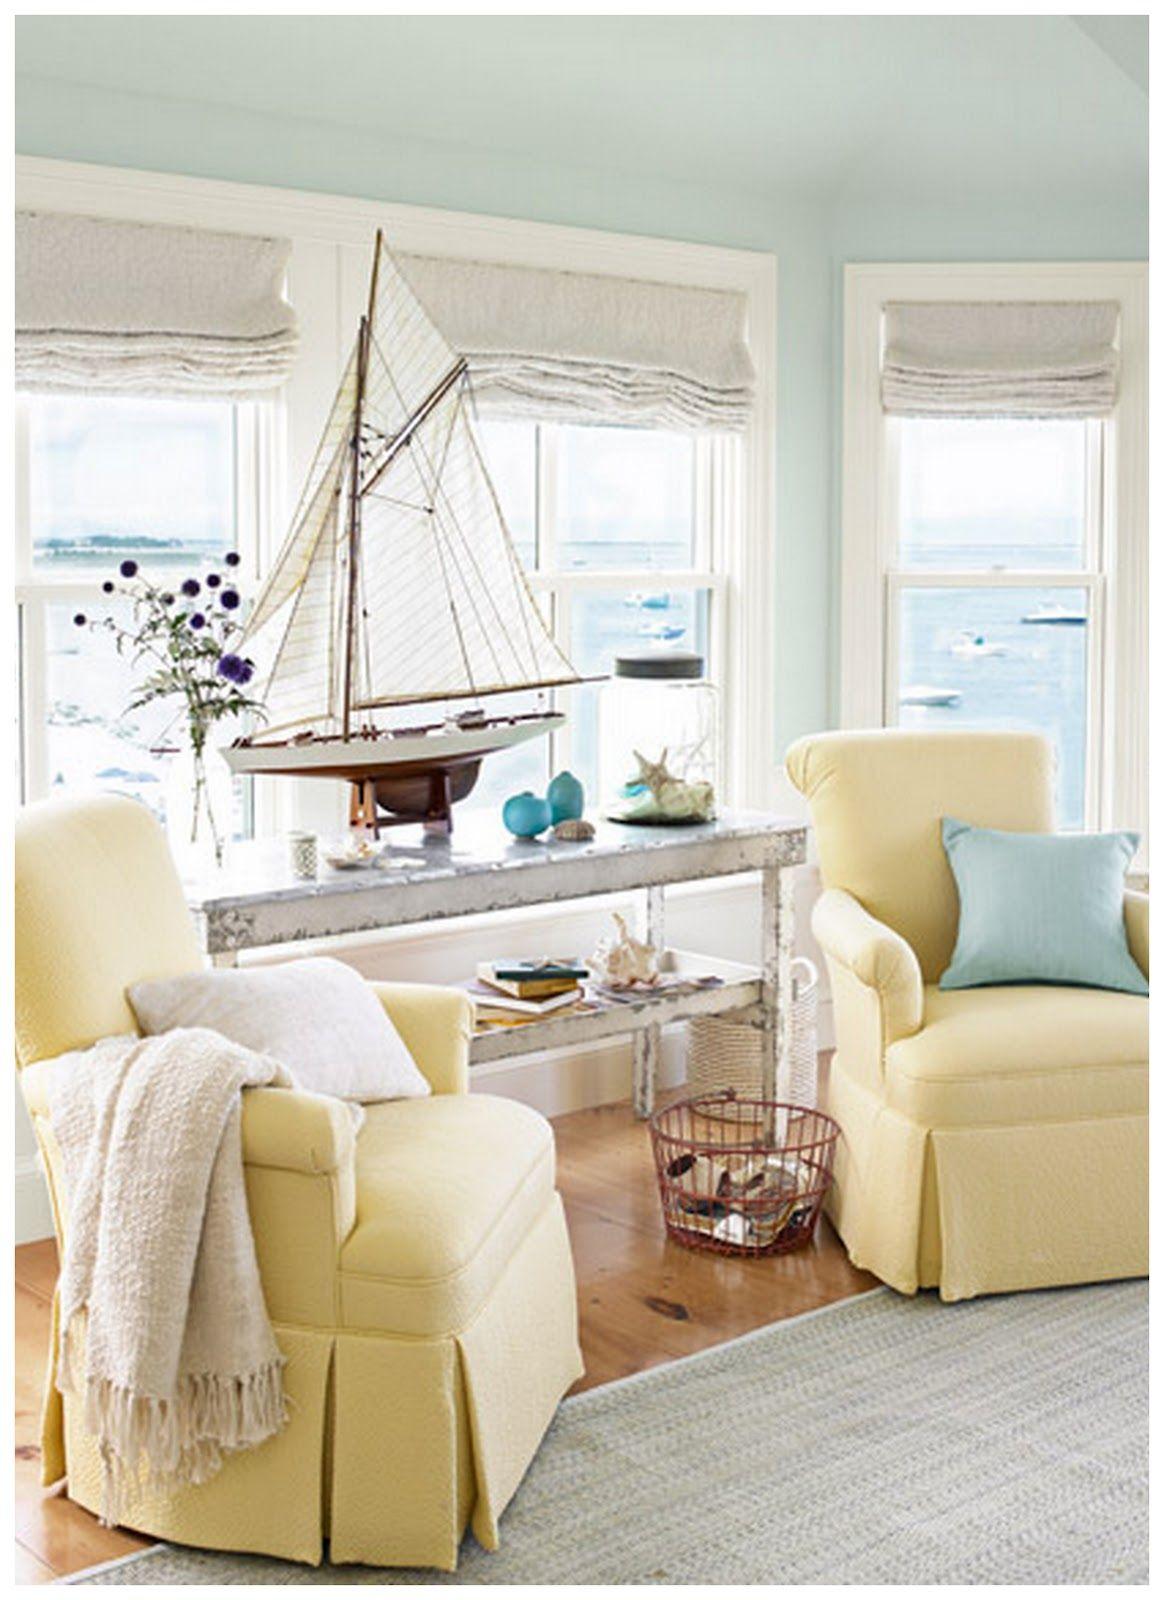 41 easy breezy beach house decorating ideas | pastel interior